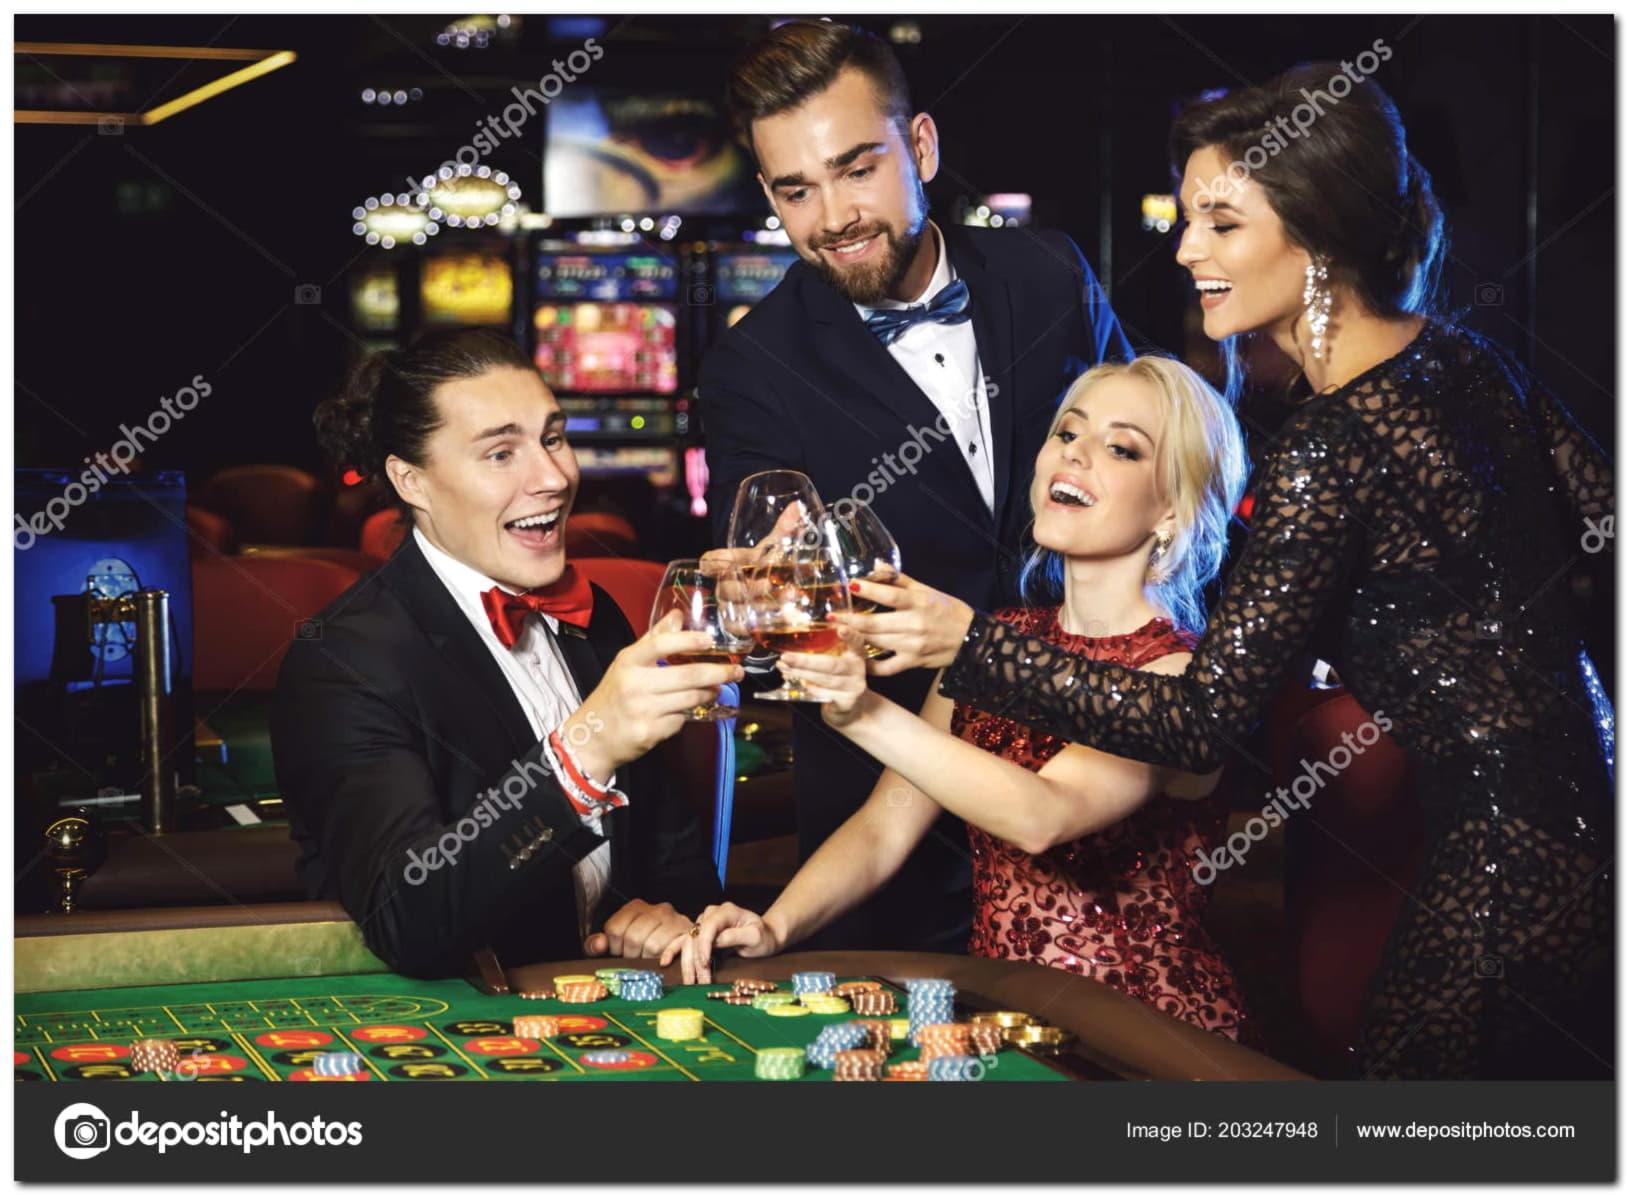 EUR 720 No deposit bonus casino at 7 Reels Casino